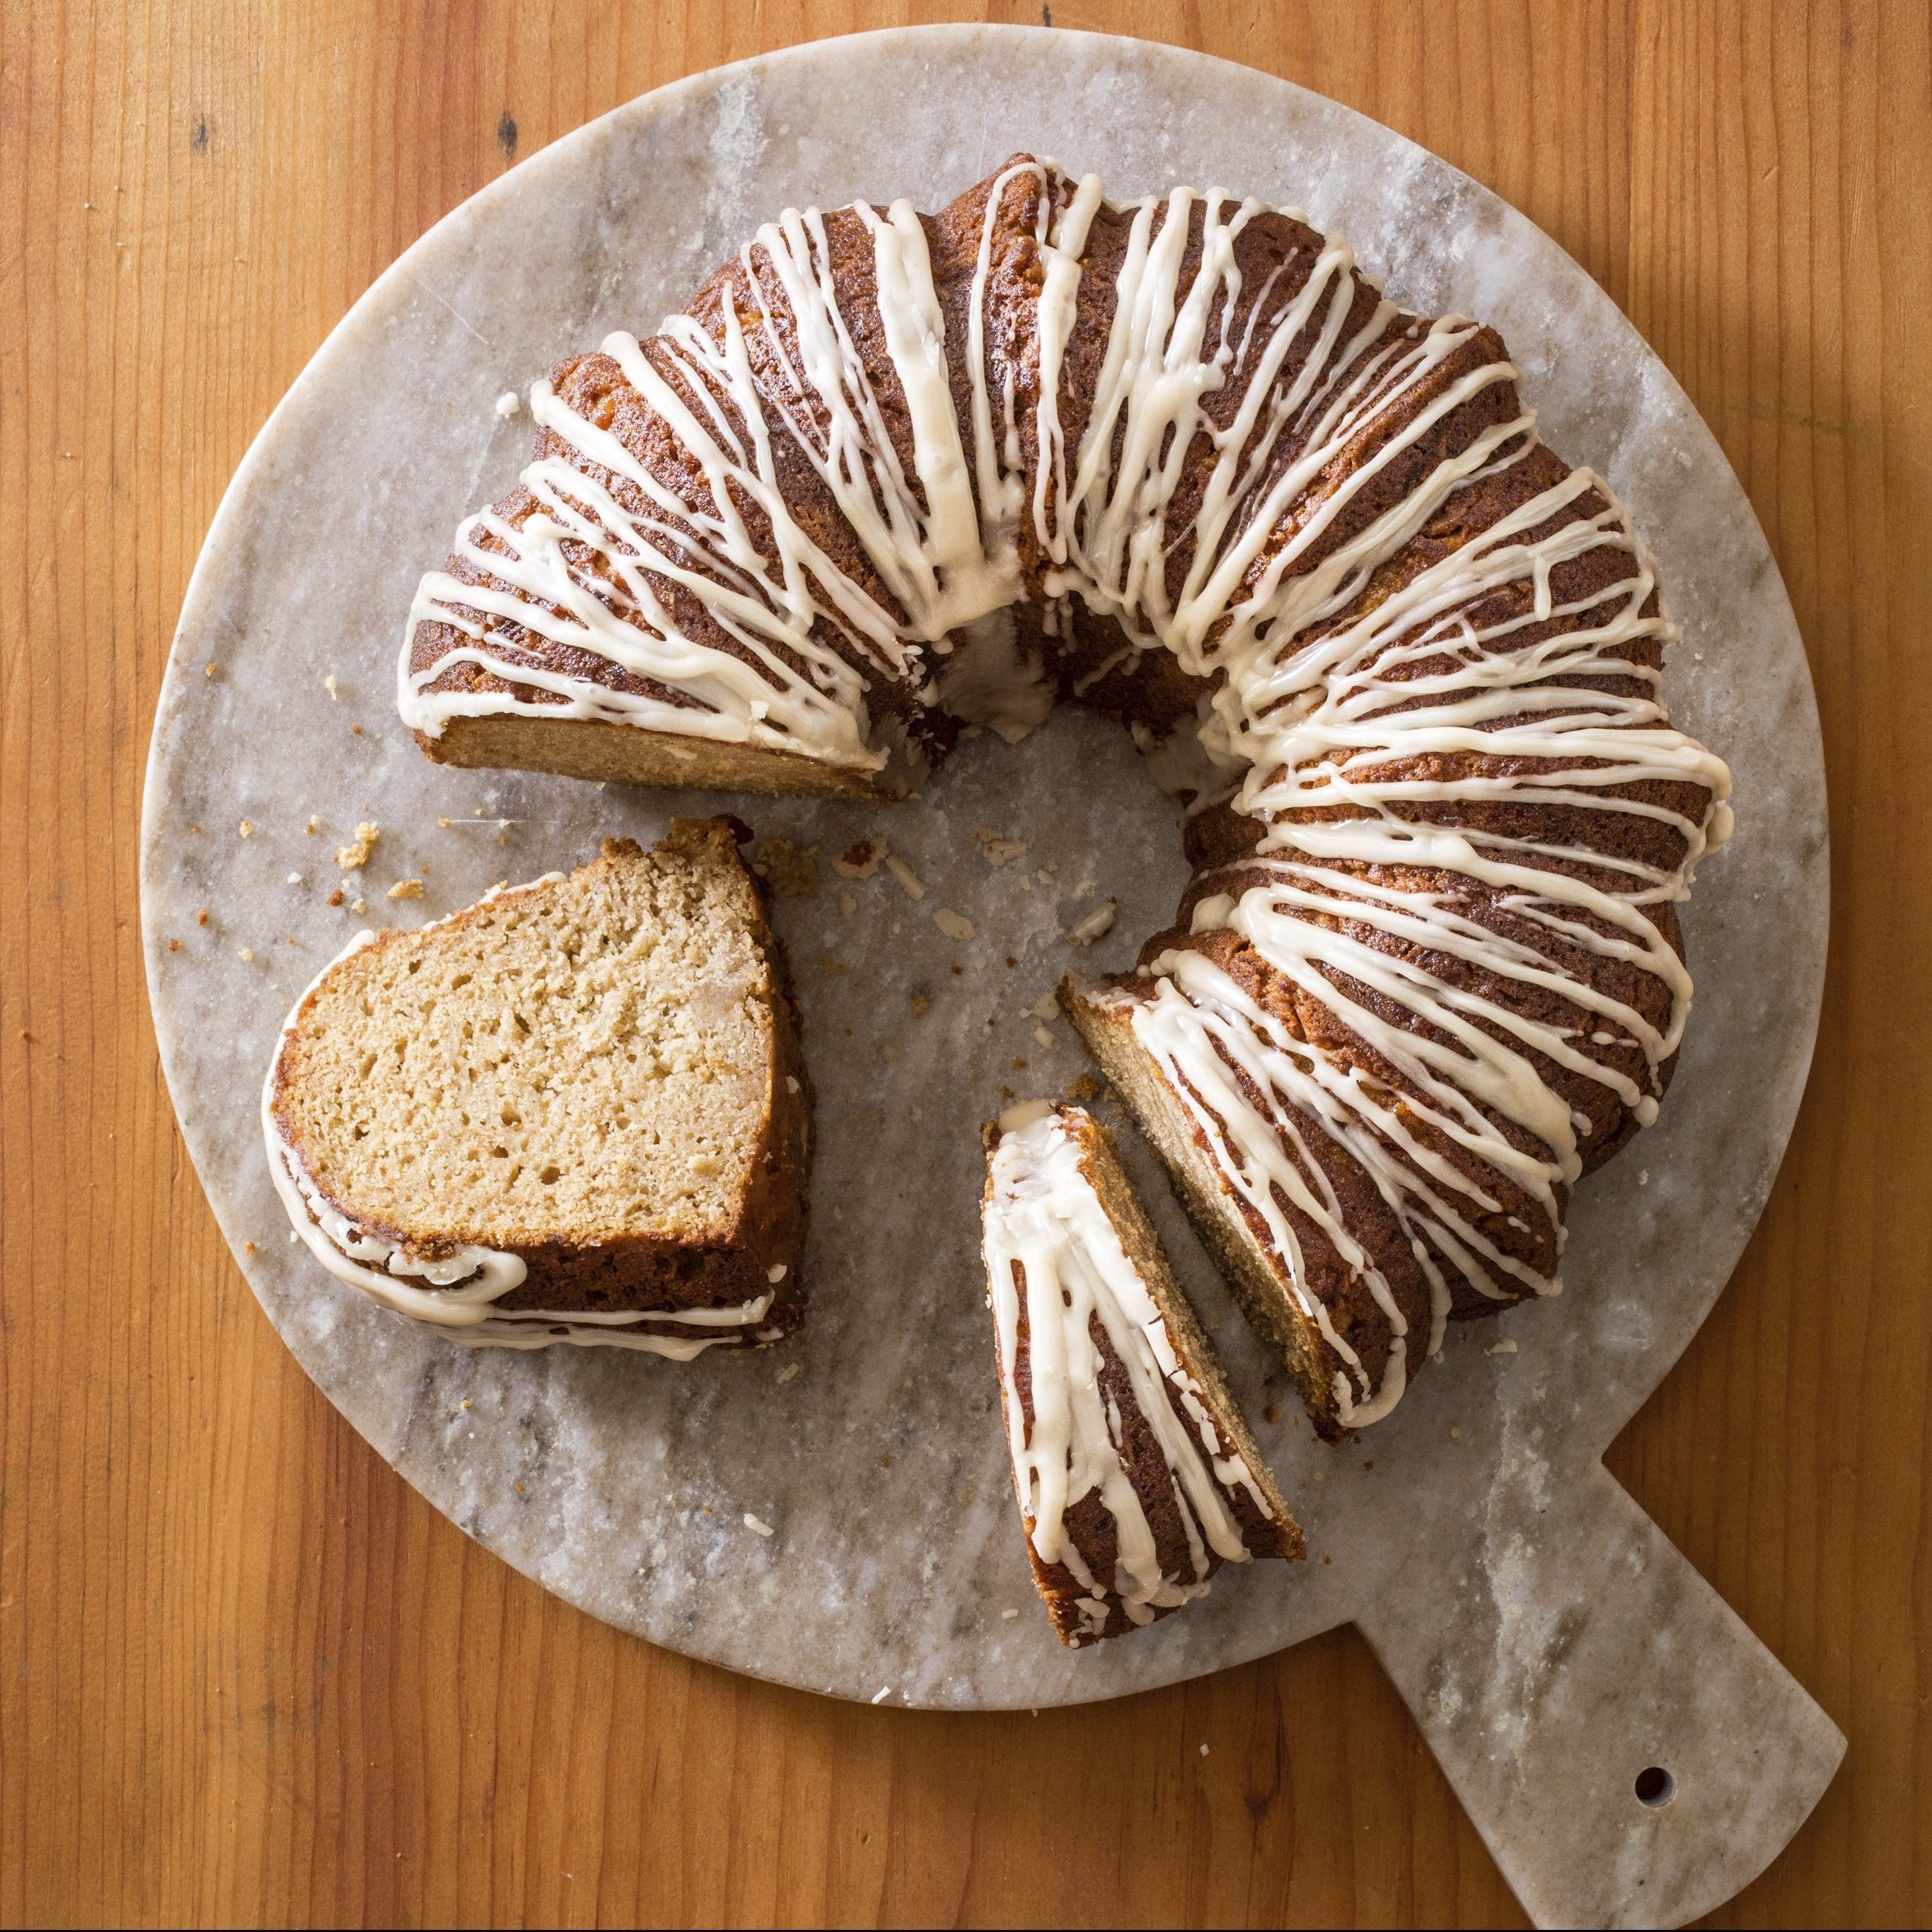 This Bundt cake demands a spot in your next brunch spread